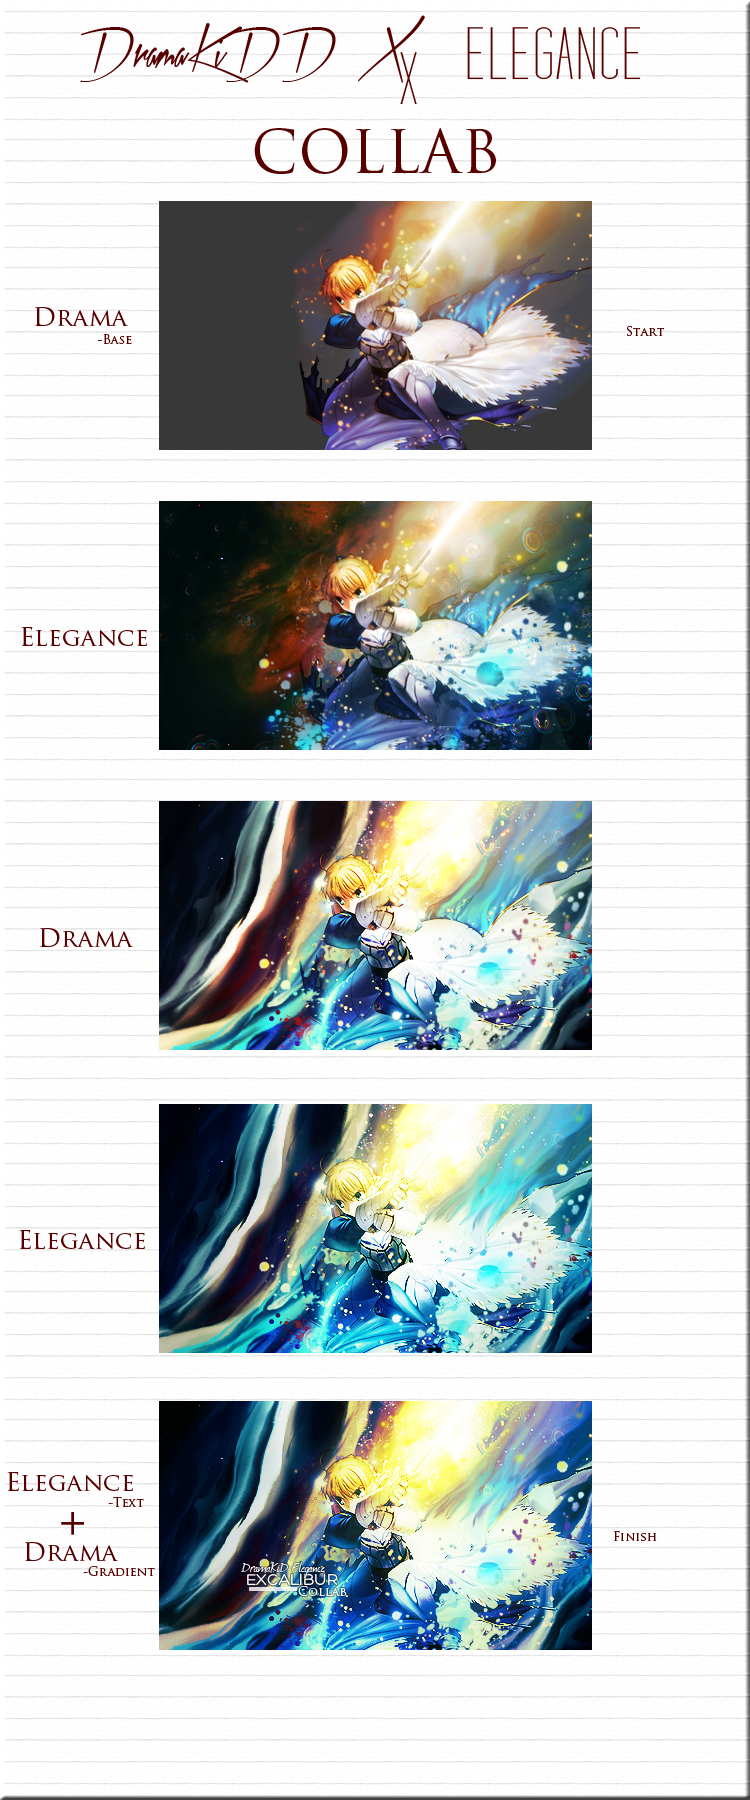 DramaKiDD x Elegance Signature Collab by DramaSama